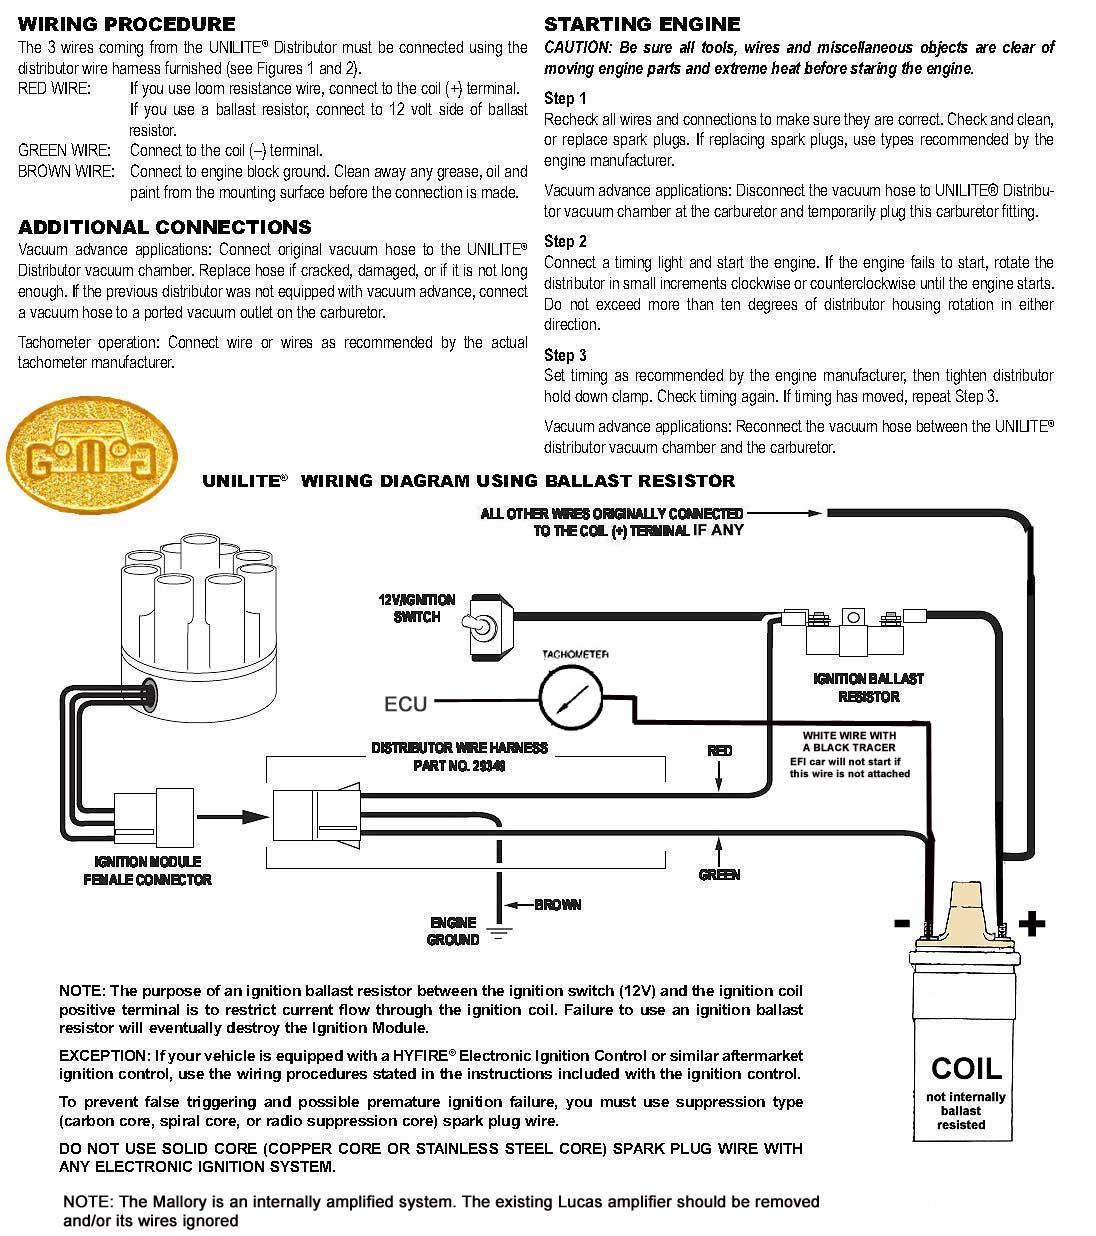 Ballast Resistor Wiring Diagram : Dodge ballast resistor wiring boat motor elsavadorla